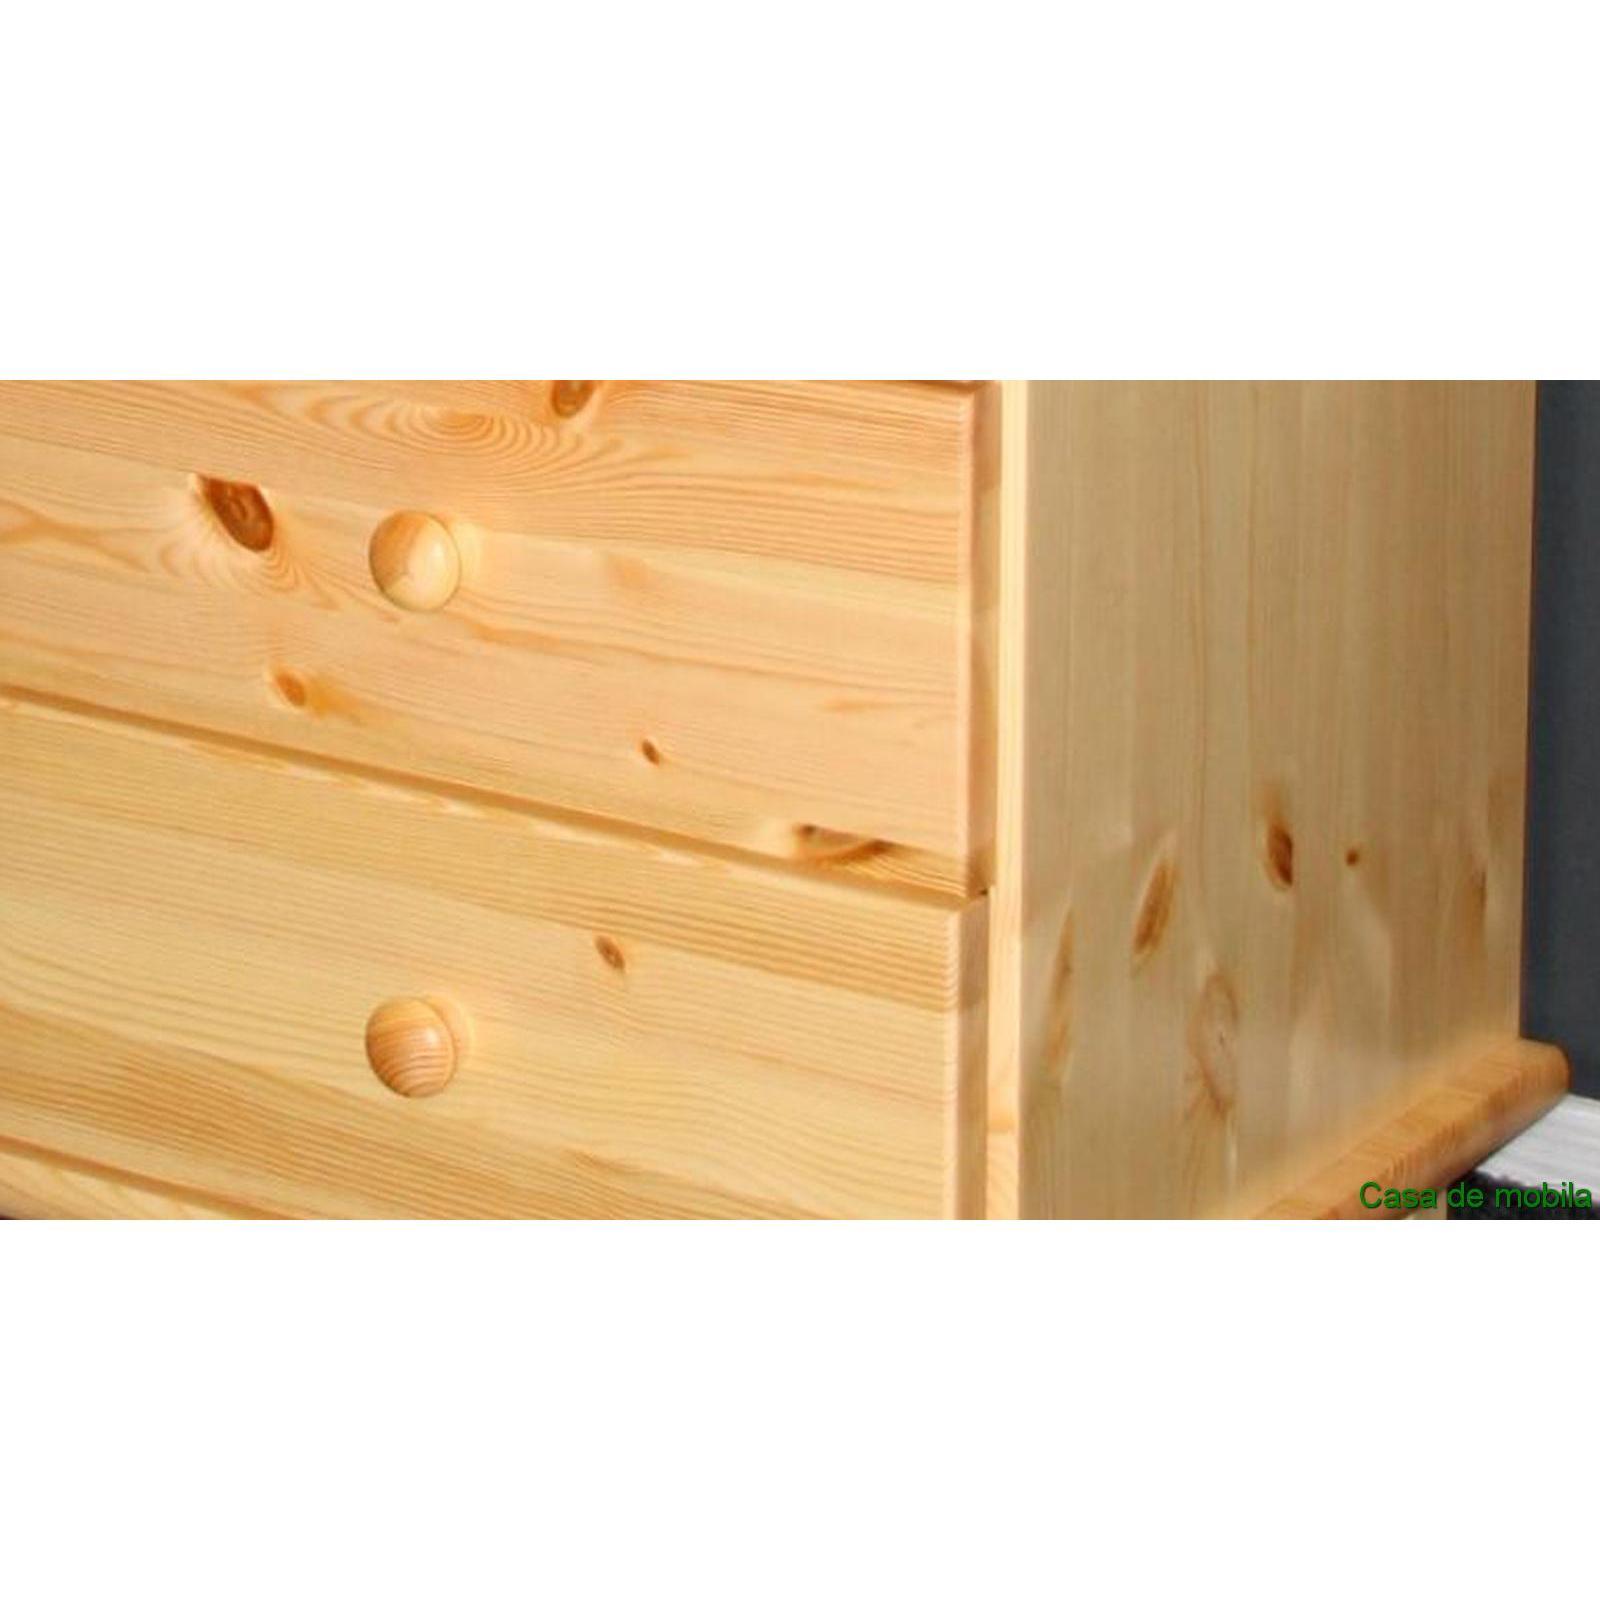 Massivholz Sideboard Kiefer massiv natur lackiert GOSLAR - Kommode mit ...